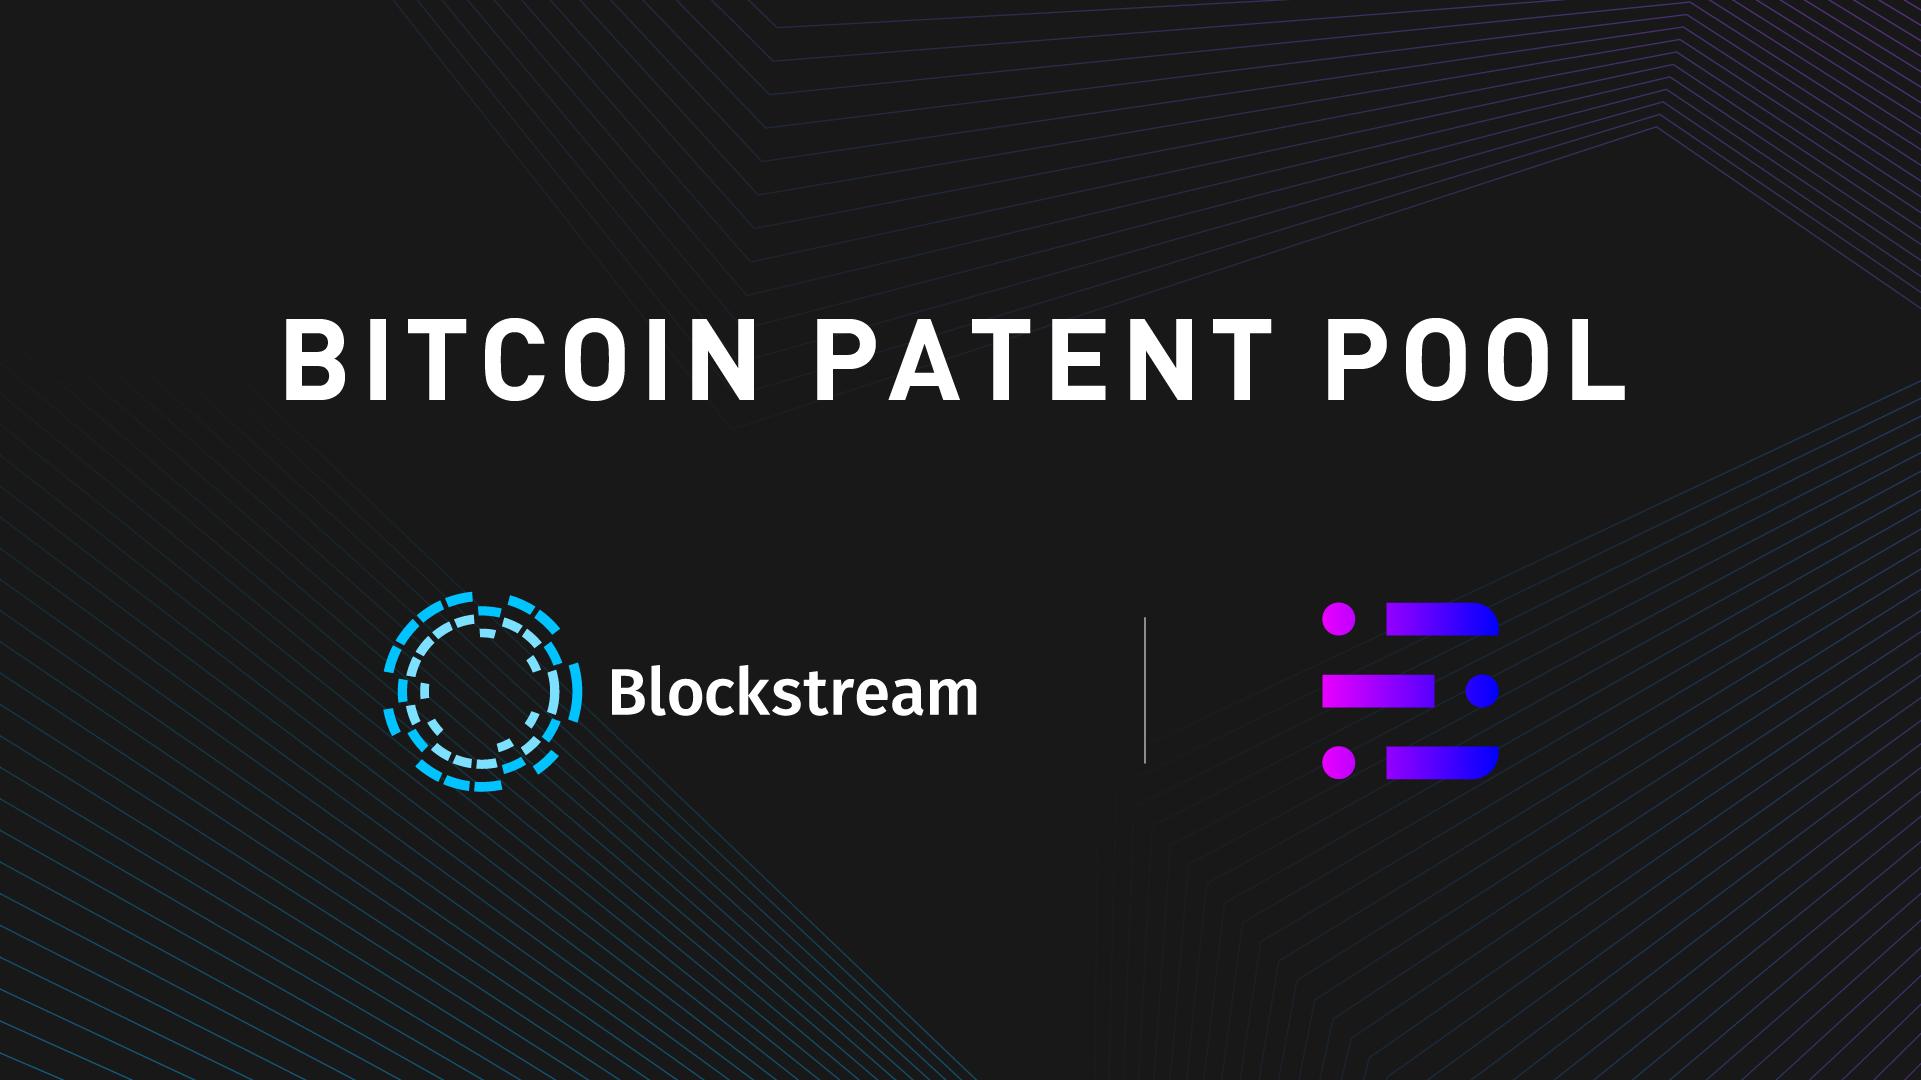 Defending Bitcoin Innovation